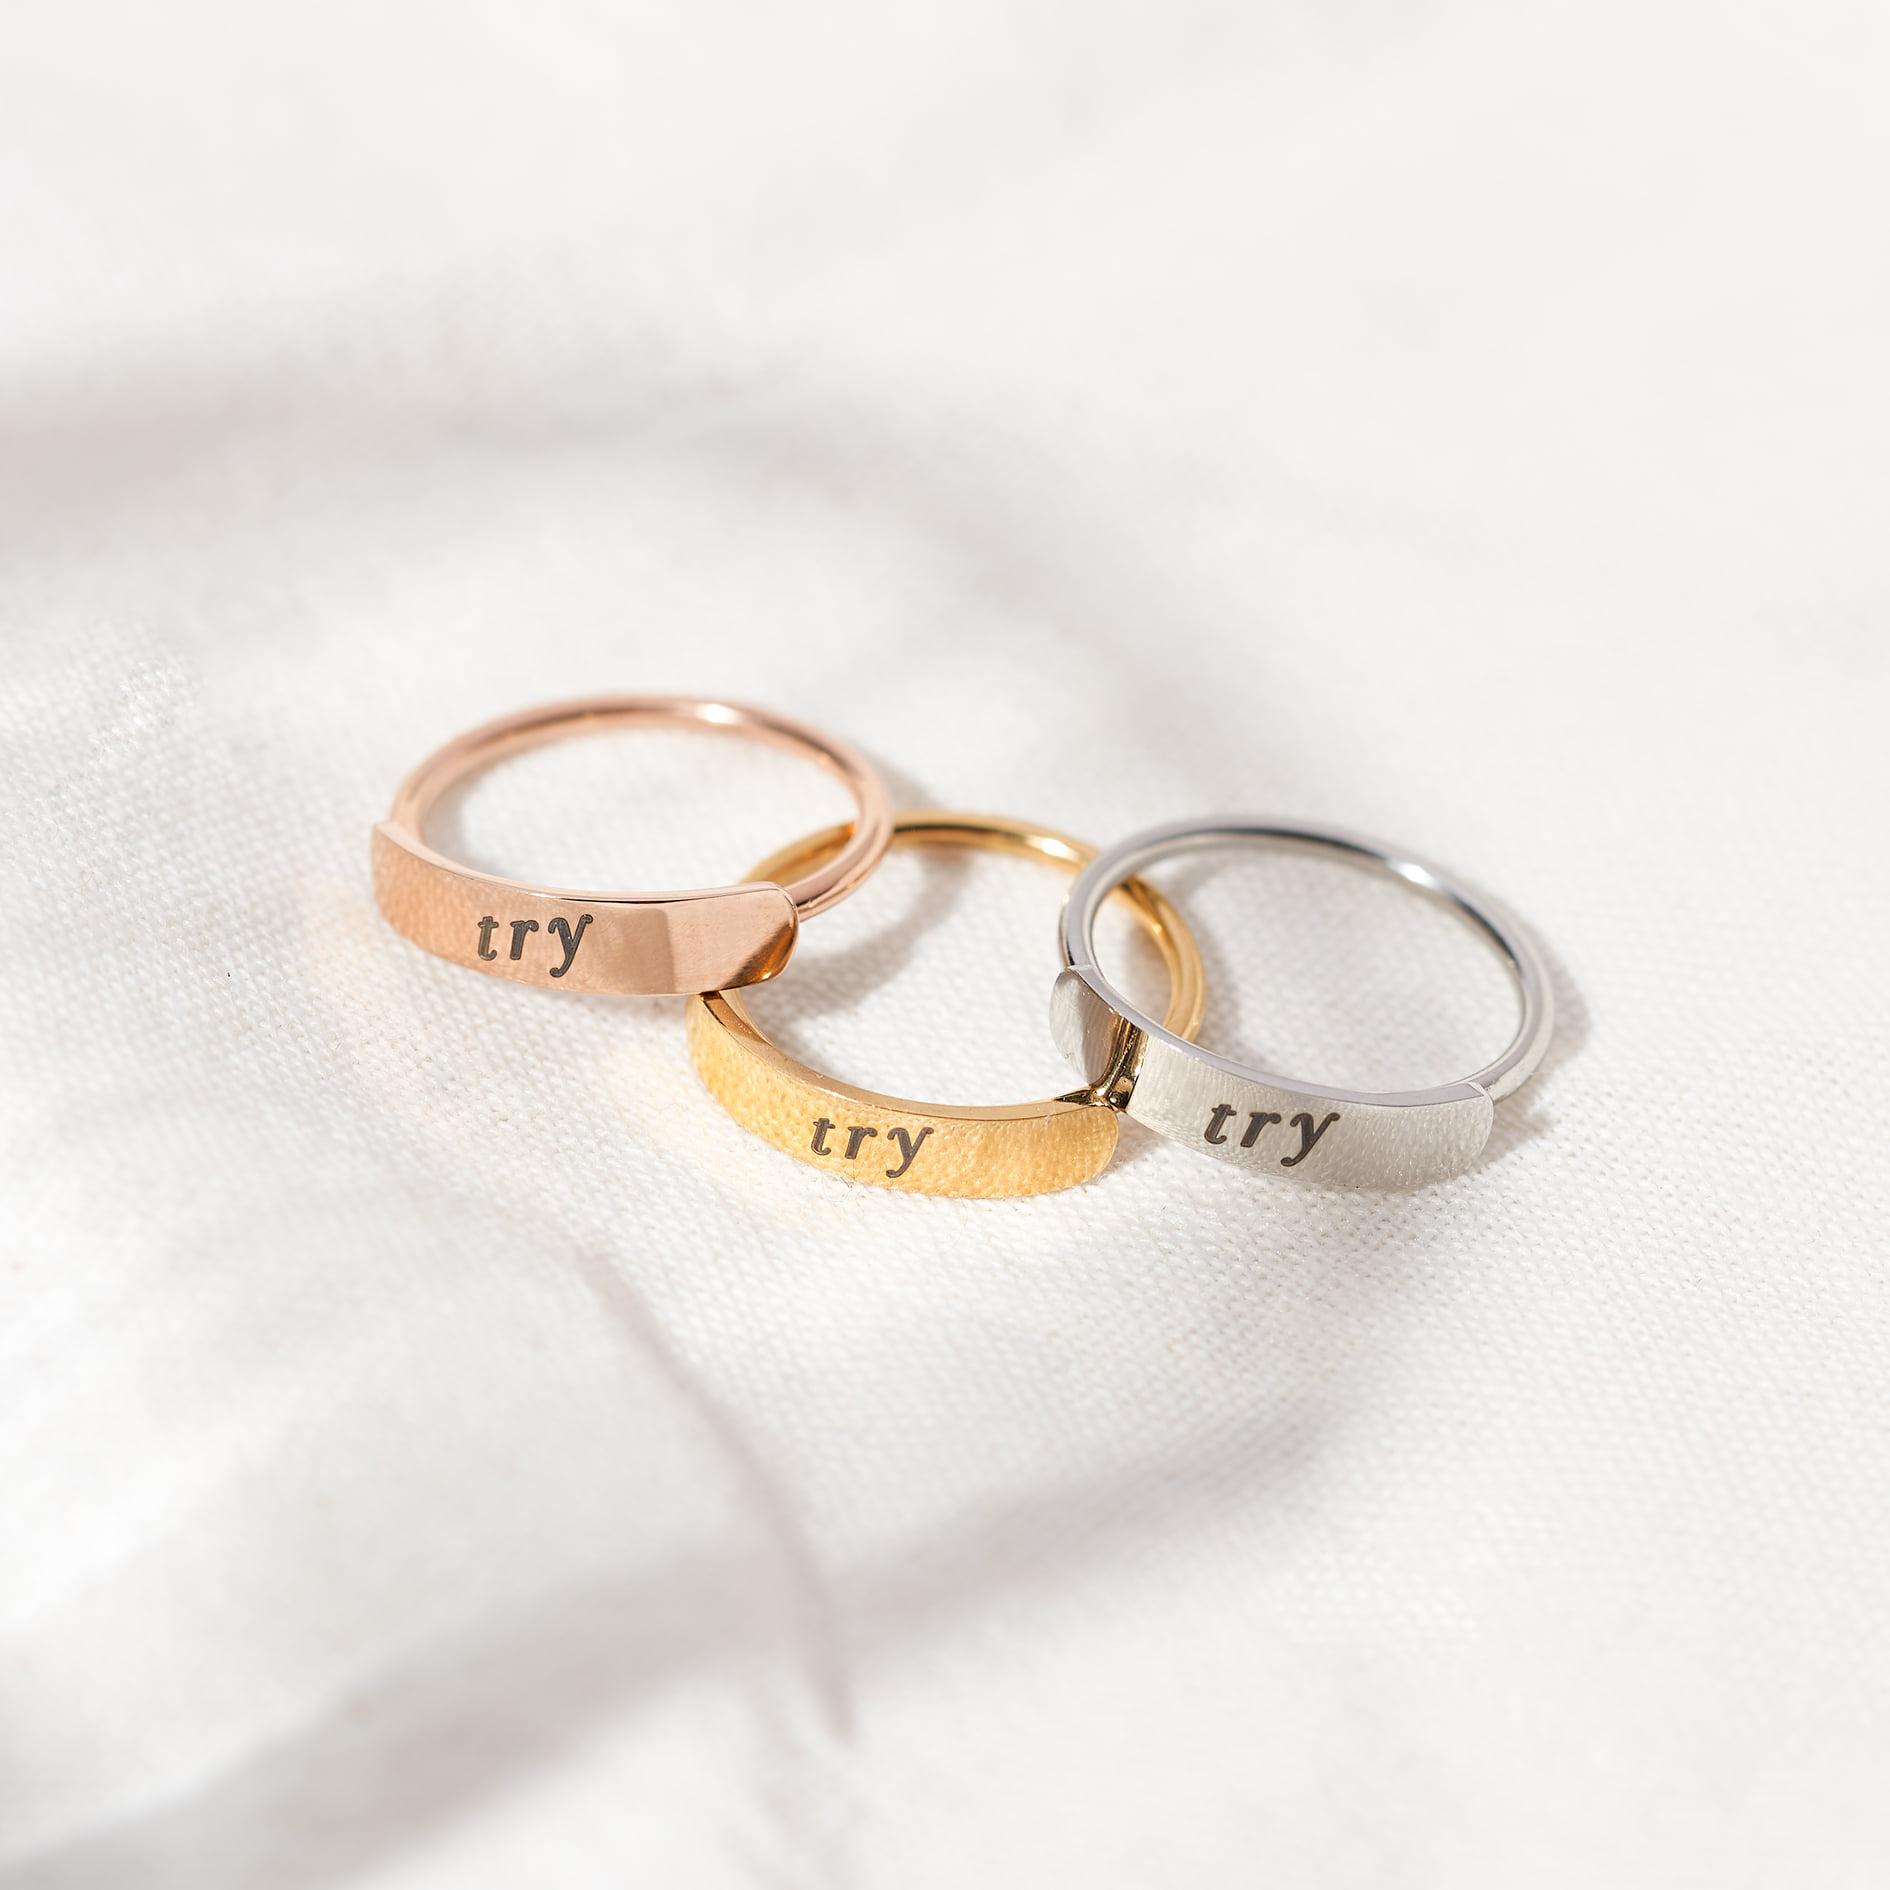 Ayn Bernos x Talaala PH jewelry collection: rings